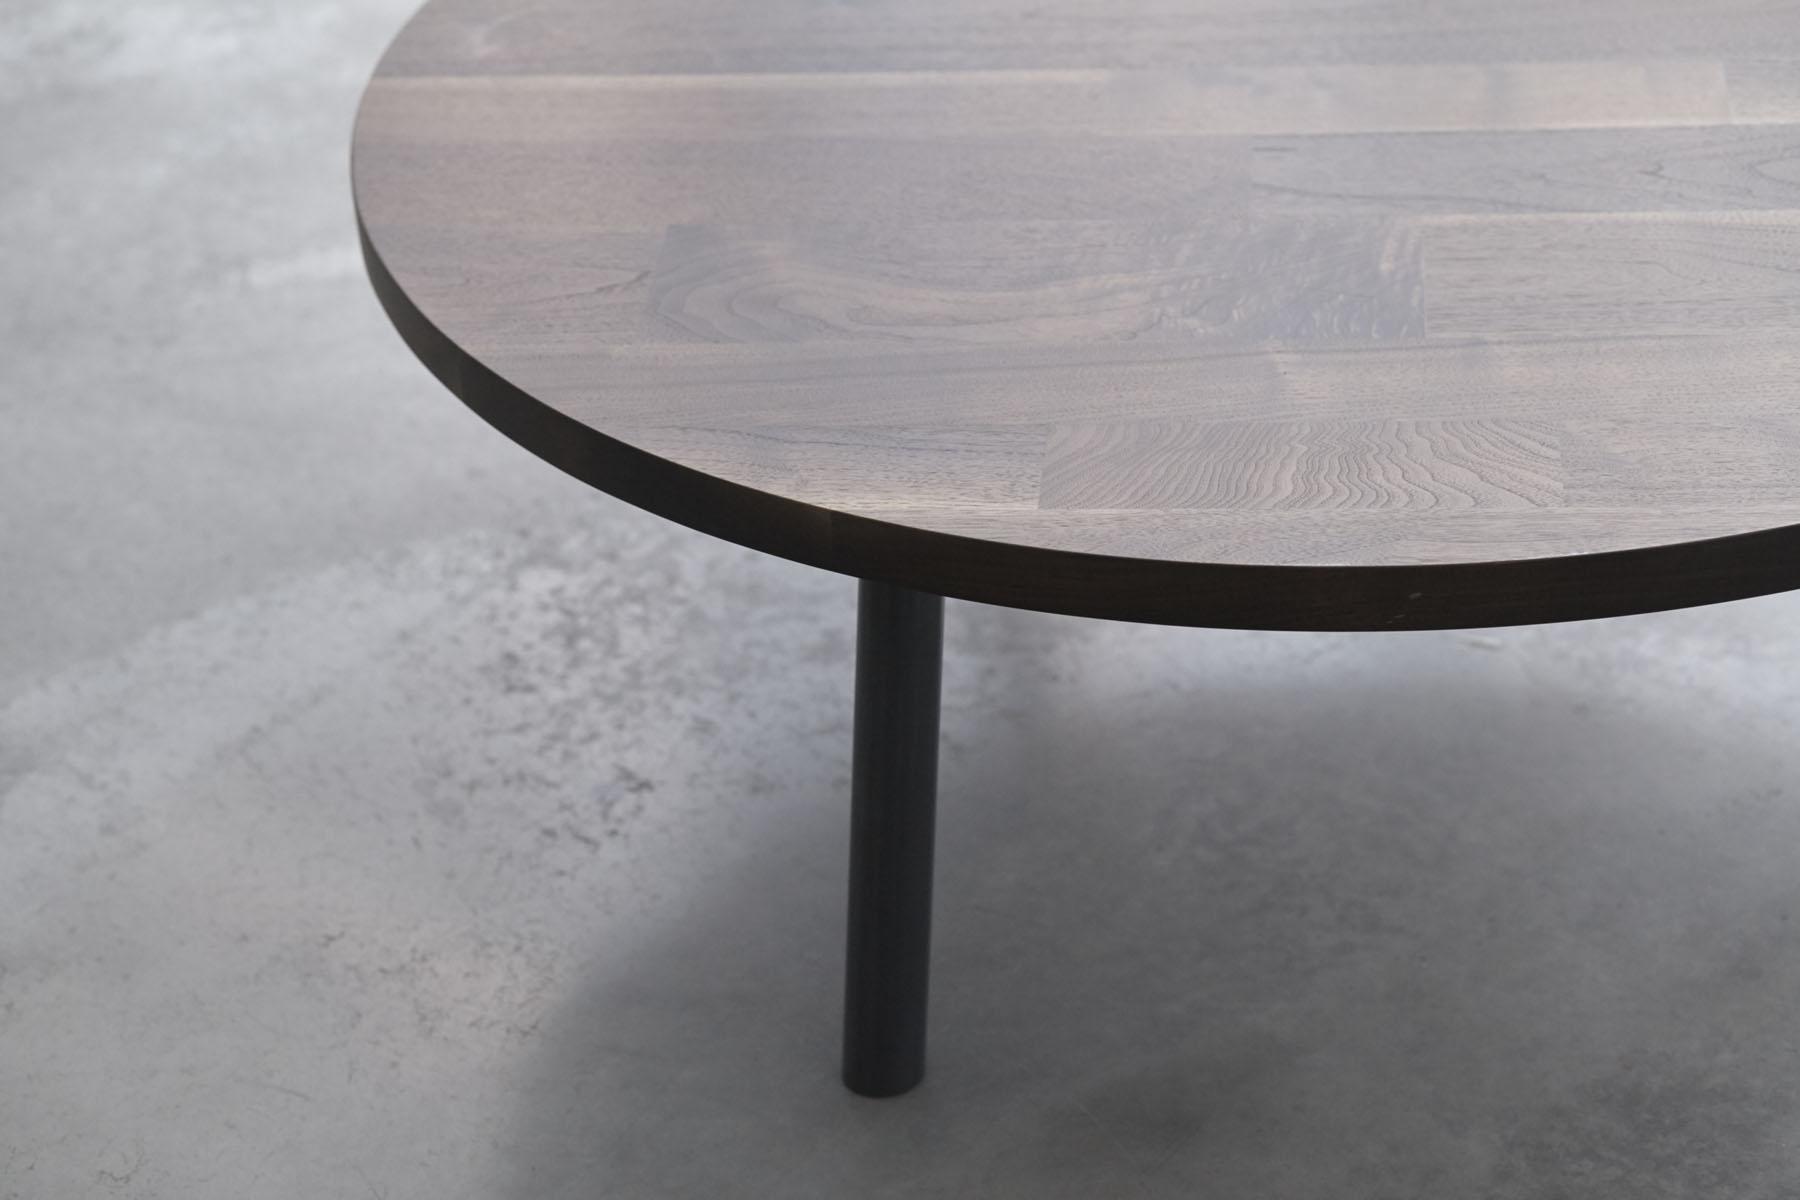 Low 3 Leg Round Table